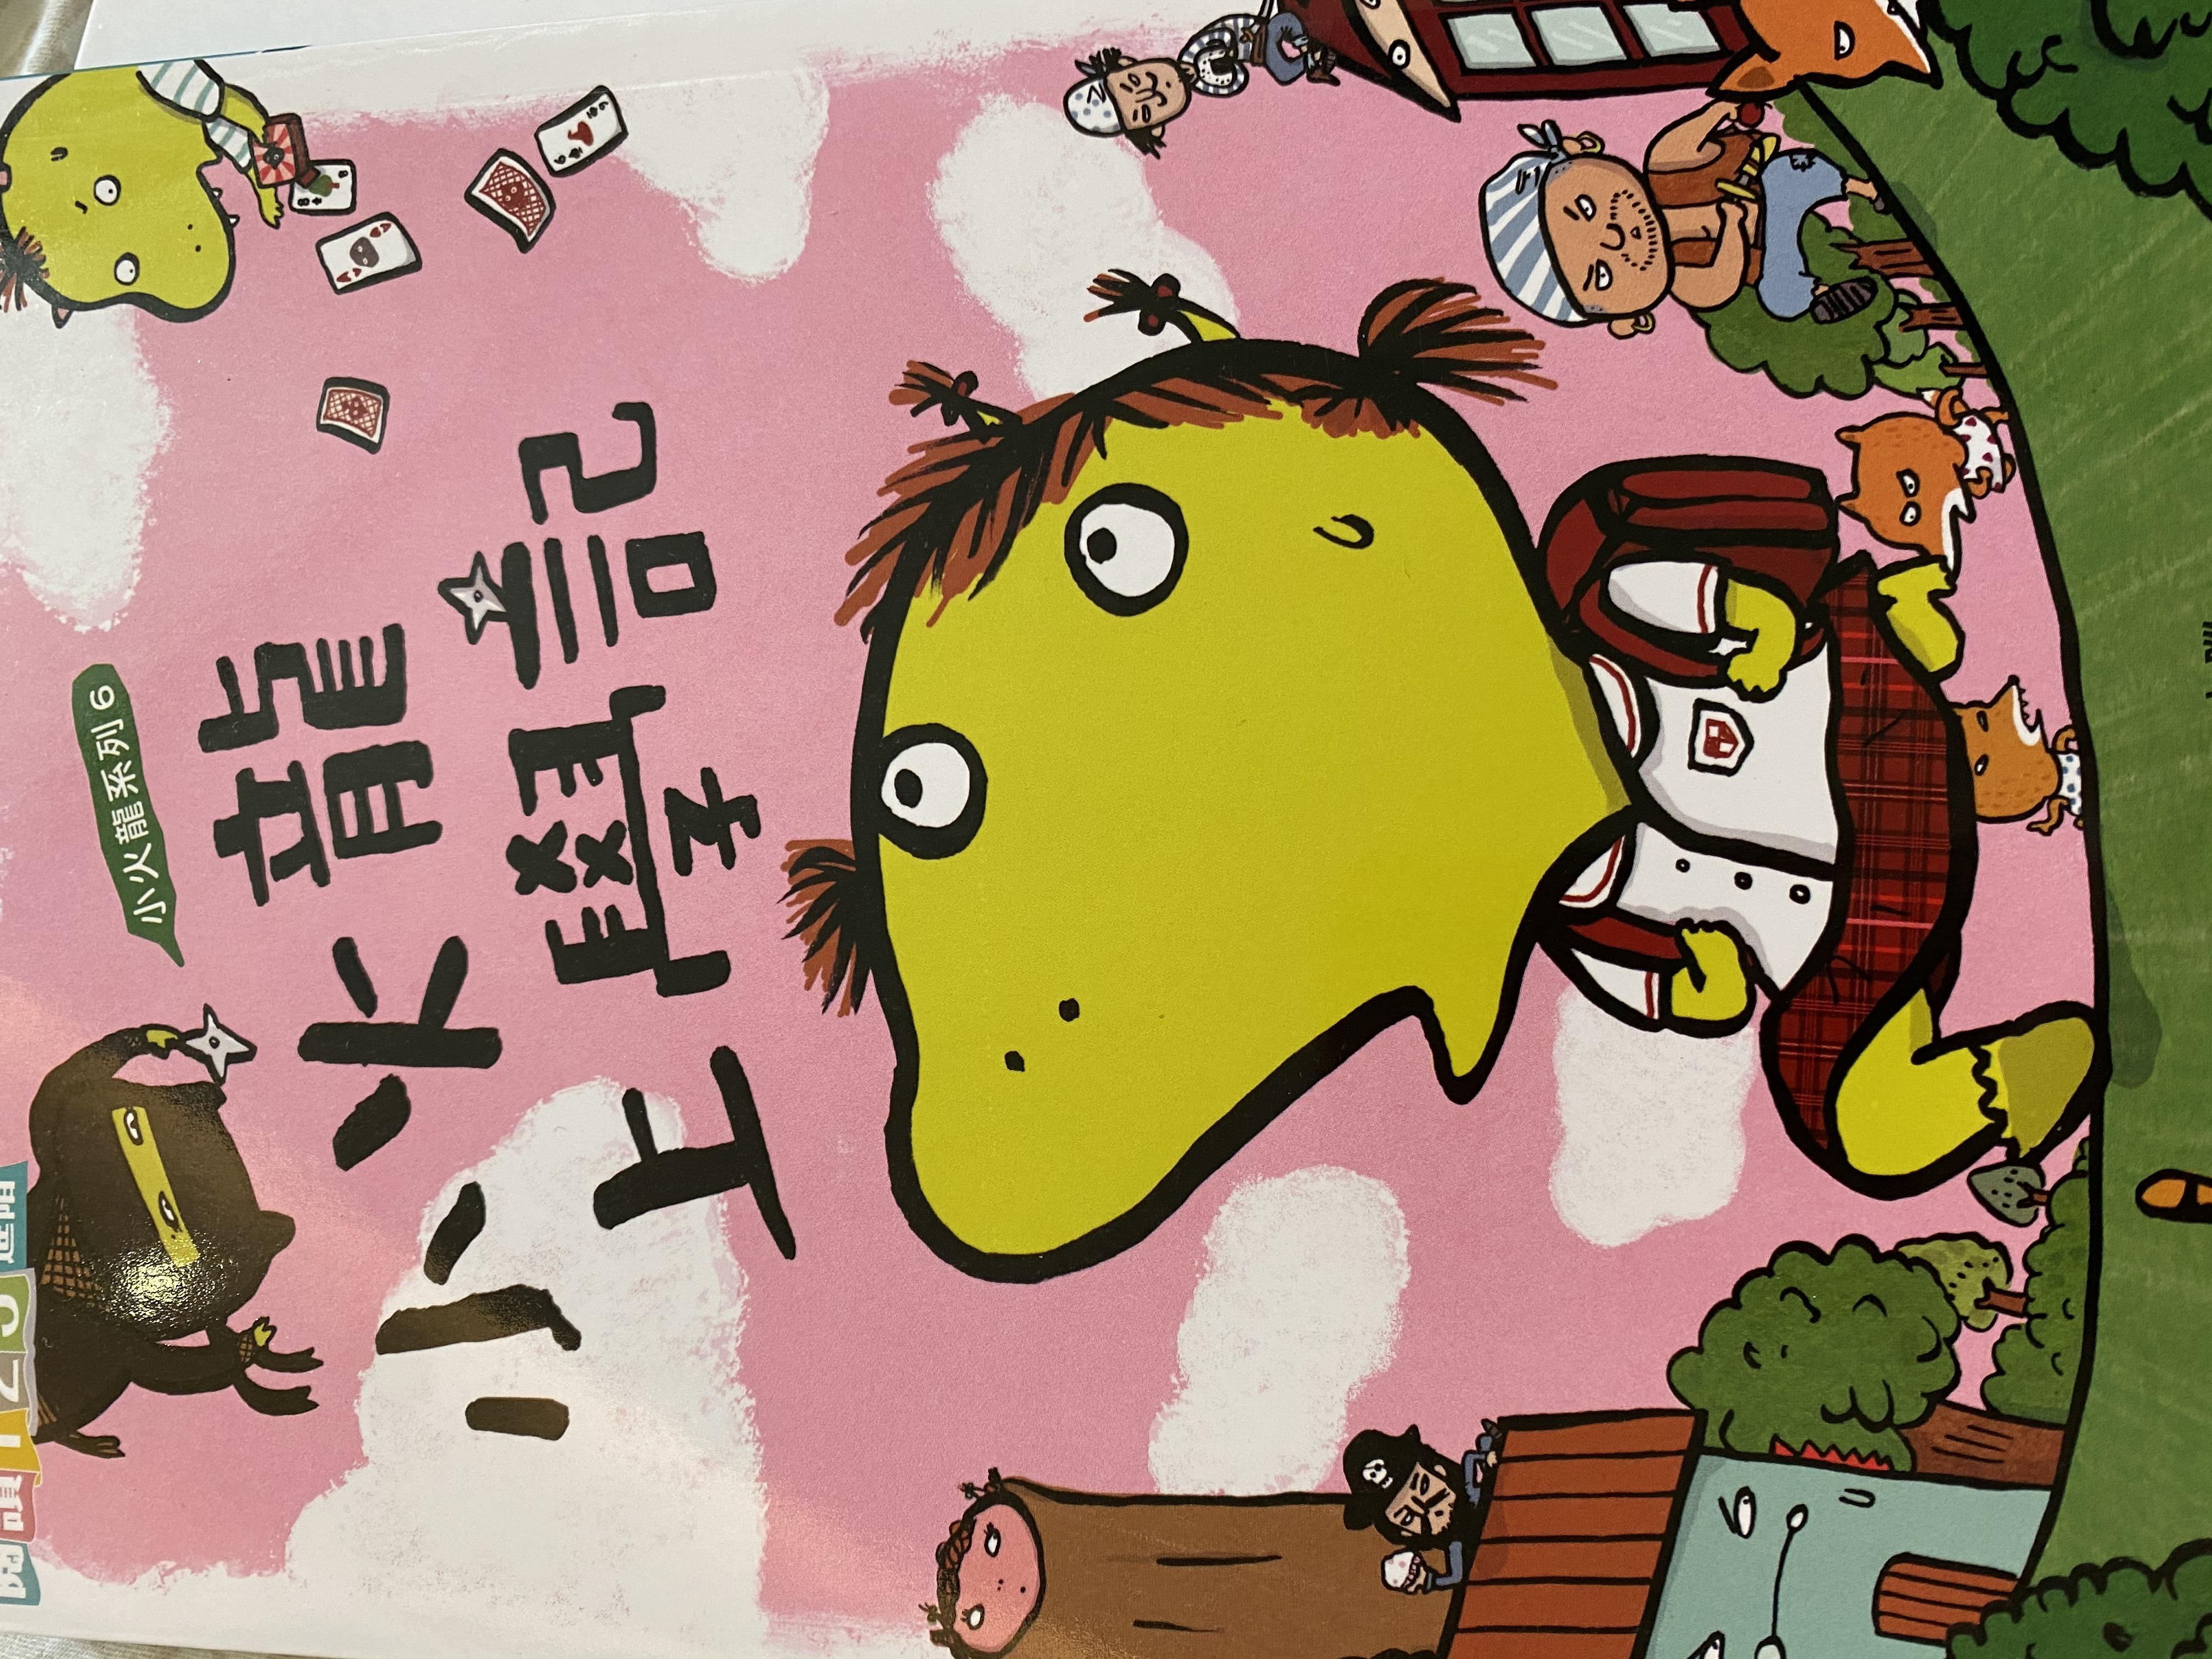 S2-022/ 小火龍上學記:真的放心讓她自己去上學嗎?/ 小火龍系列6/ chapter 1/ 哲也 水腦/ 親子天下